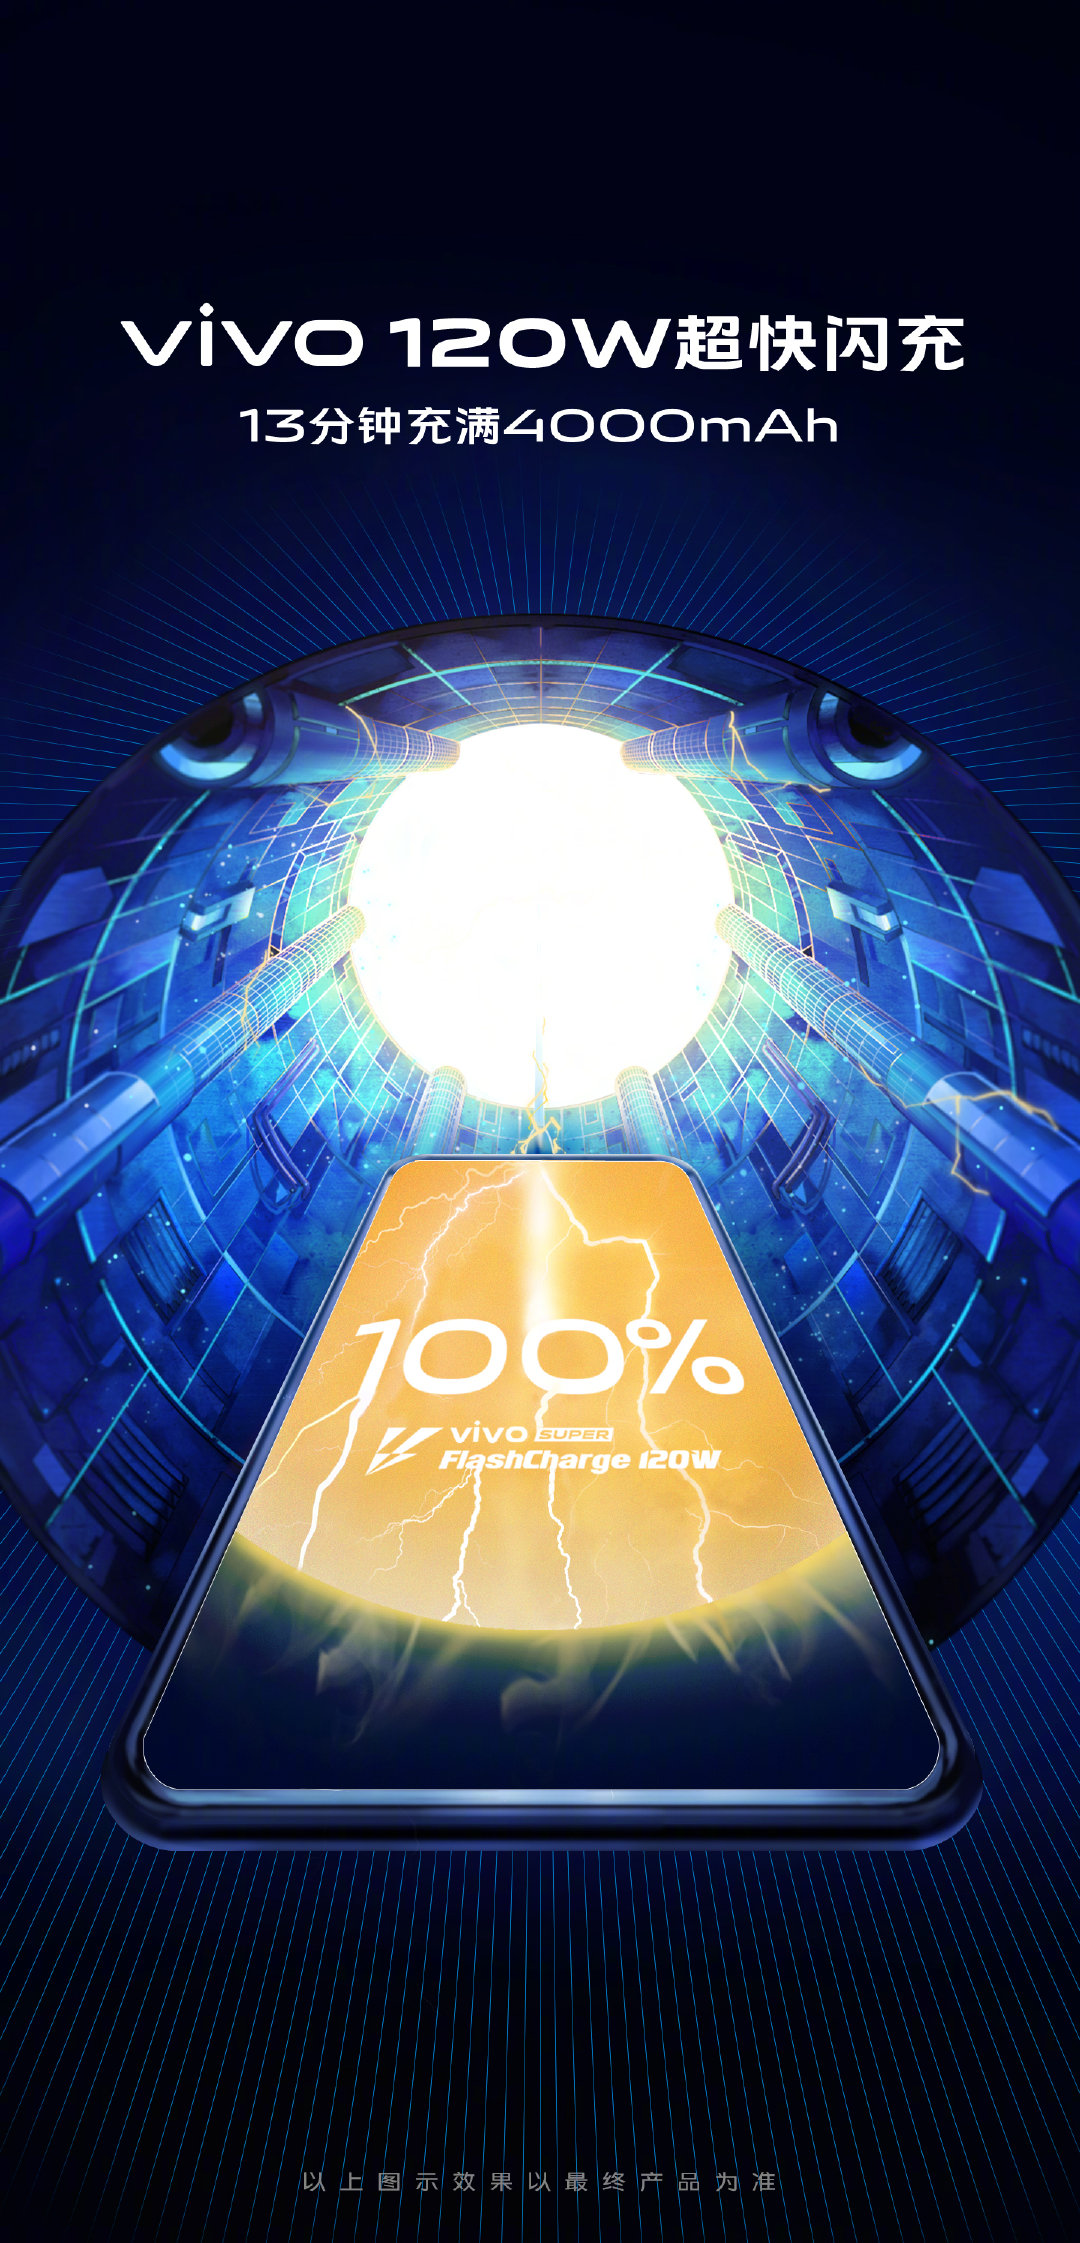 vivo 120W FlashCharge 超級閃充 告別磚頭級行動電源的新選擇